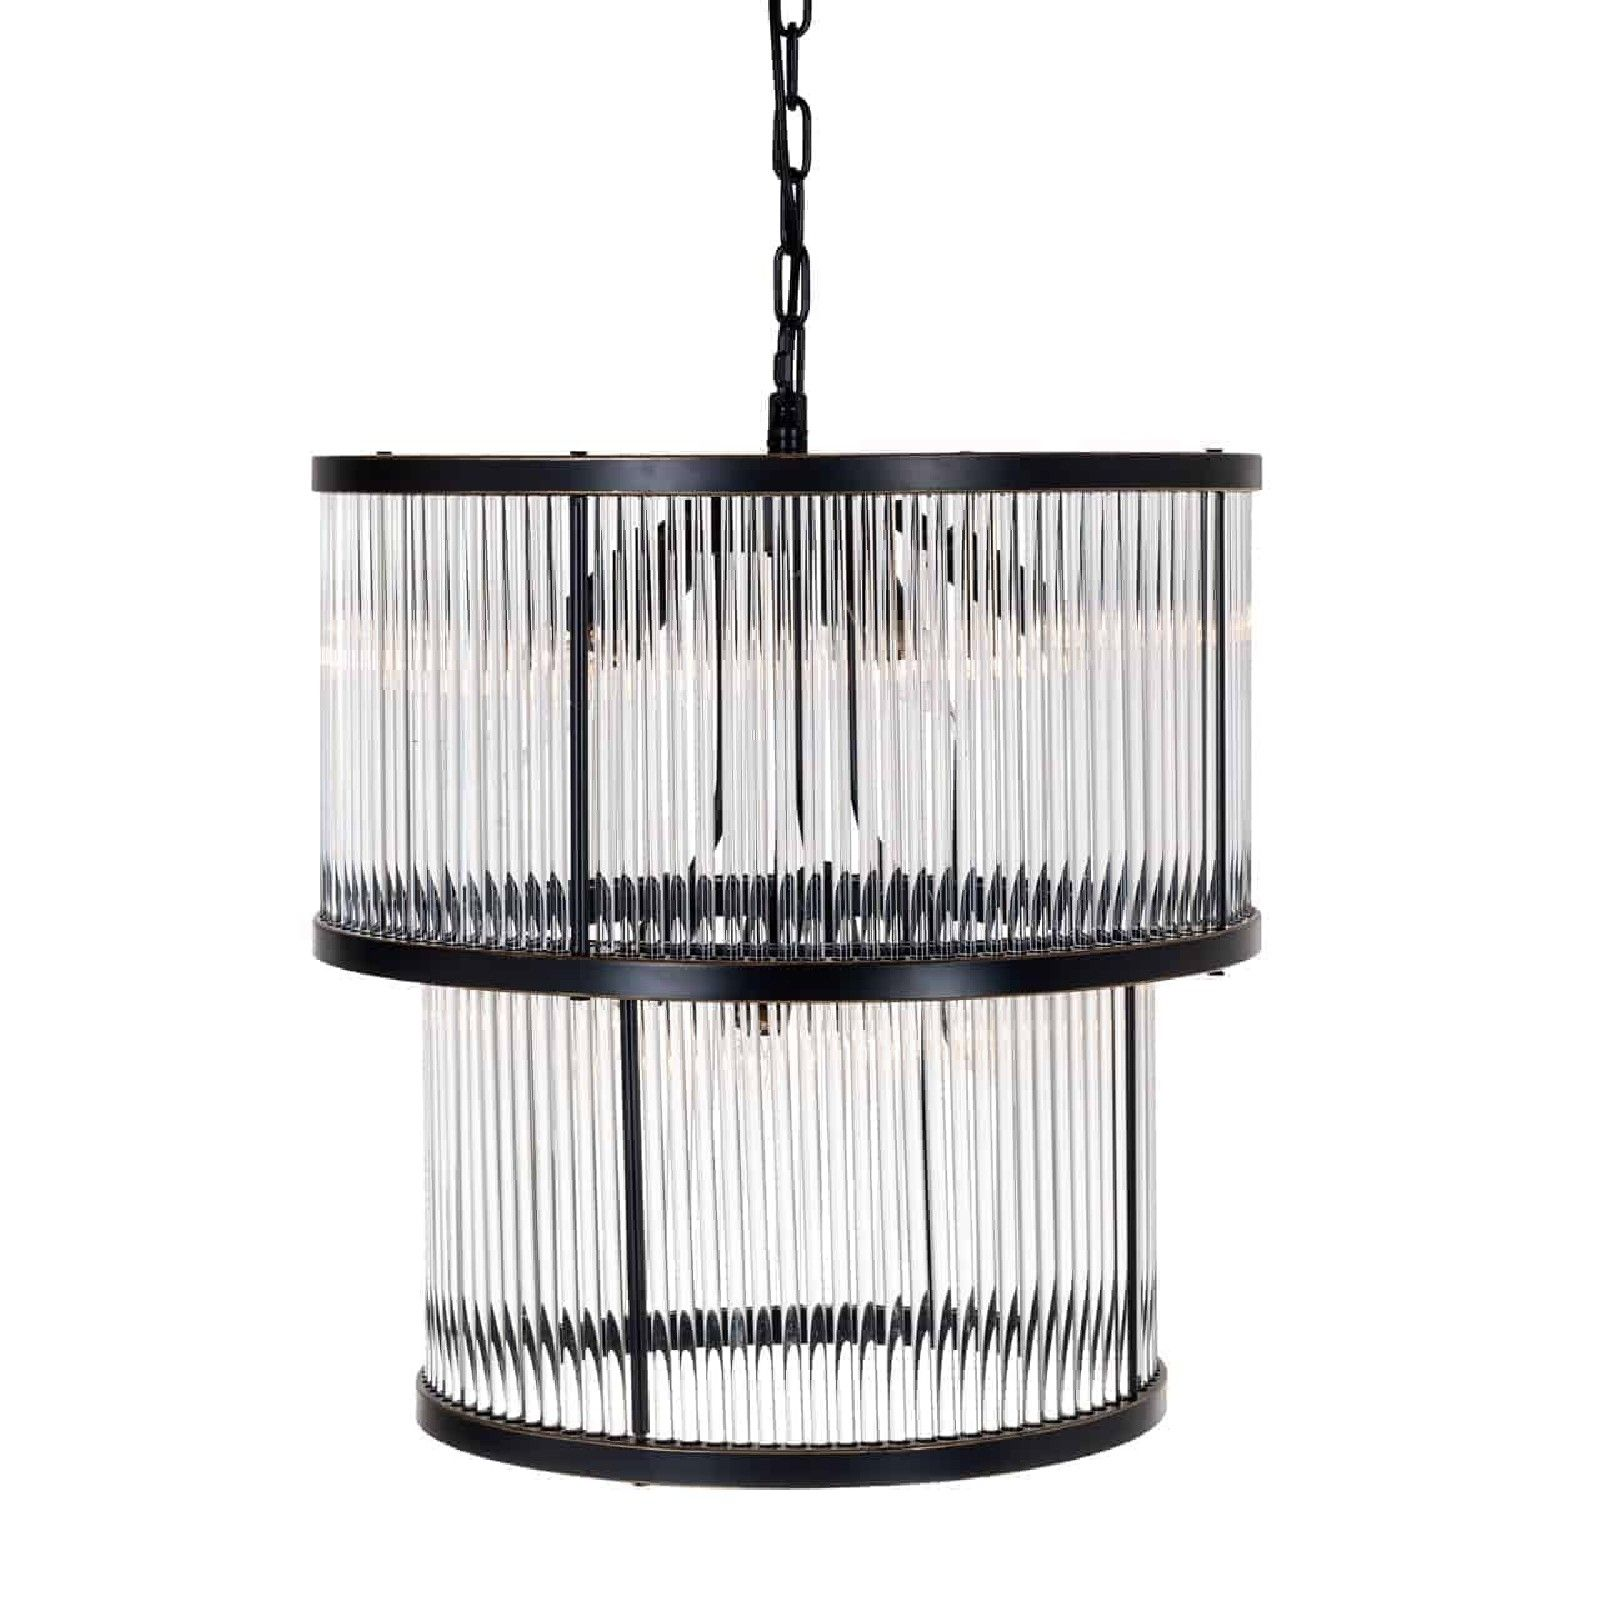 Lampe suspendue AshtonE14 / 40 watt (9 pieces) Suspensions et plafonniers - 7